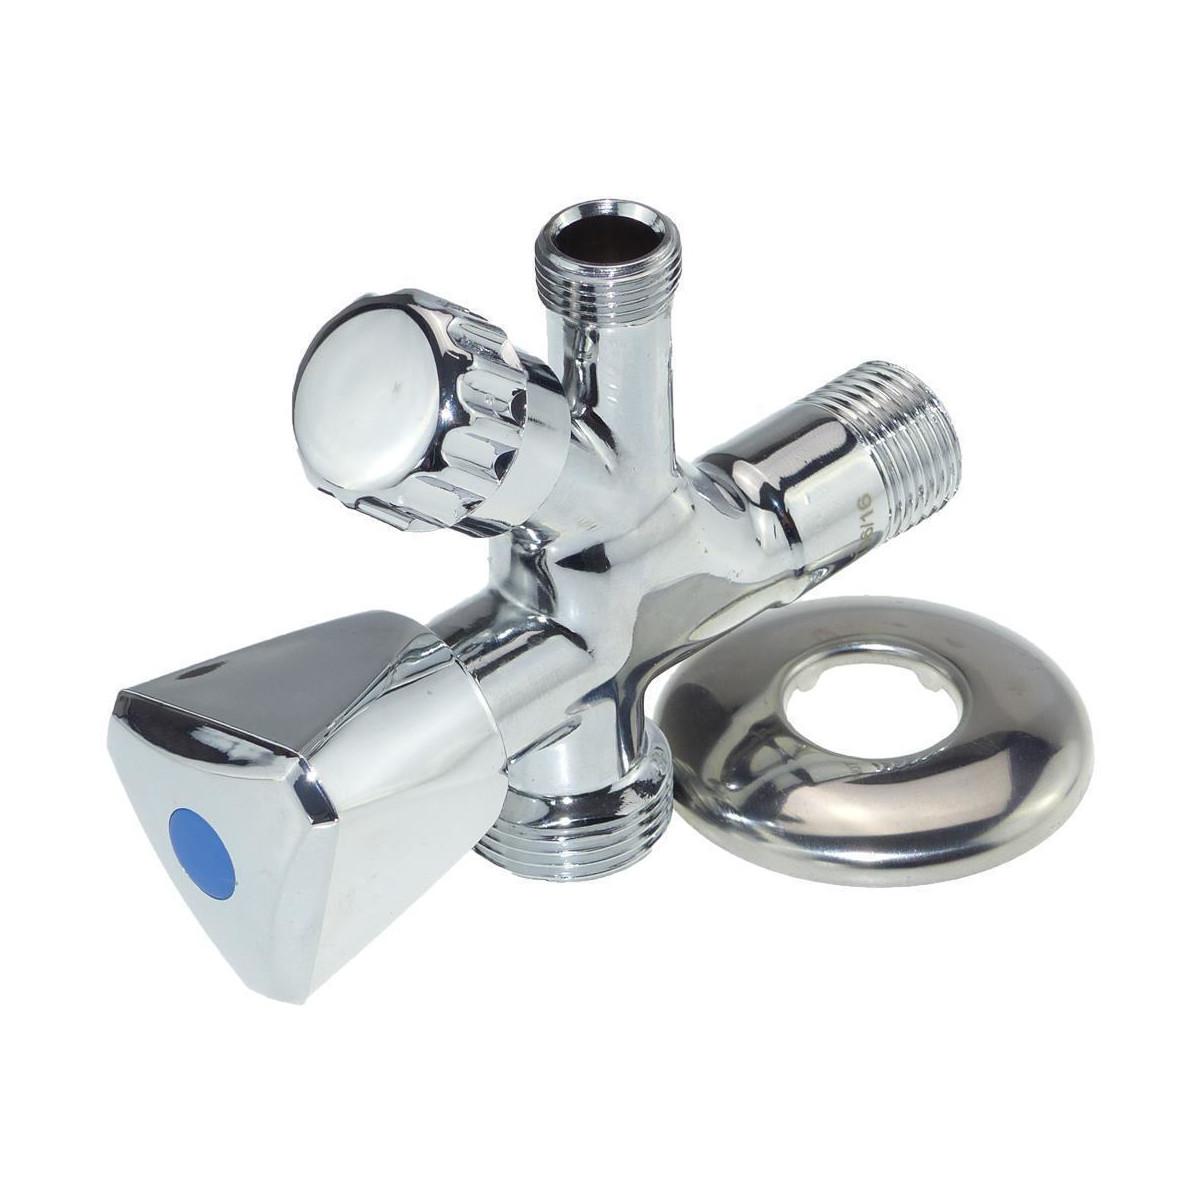 MT Business Key Eckventil 1/2 x 3/4 Zoll Kombi-Eckventil